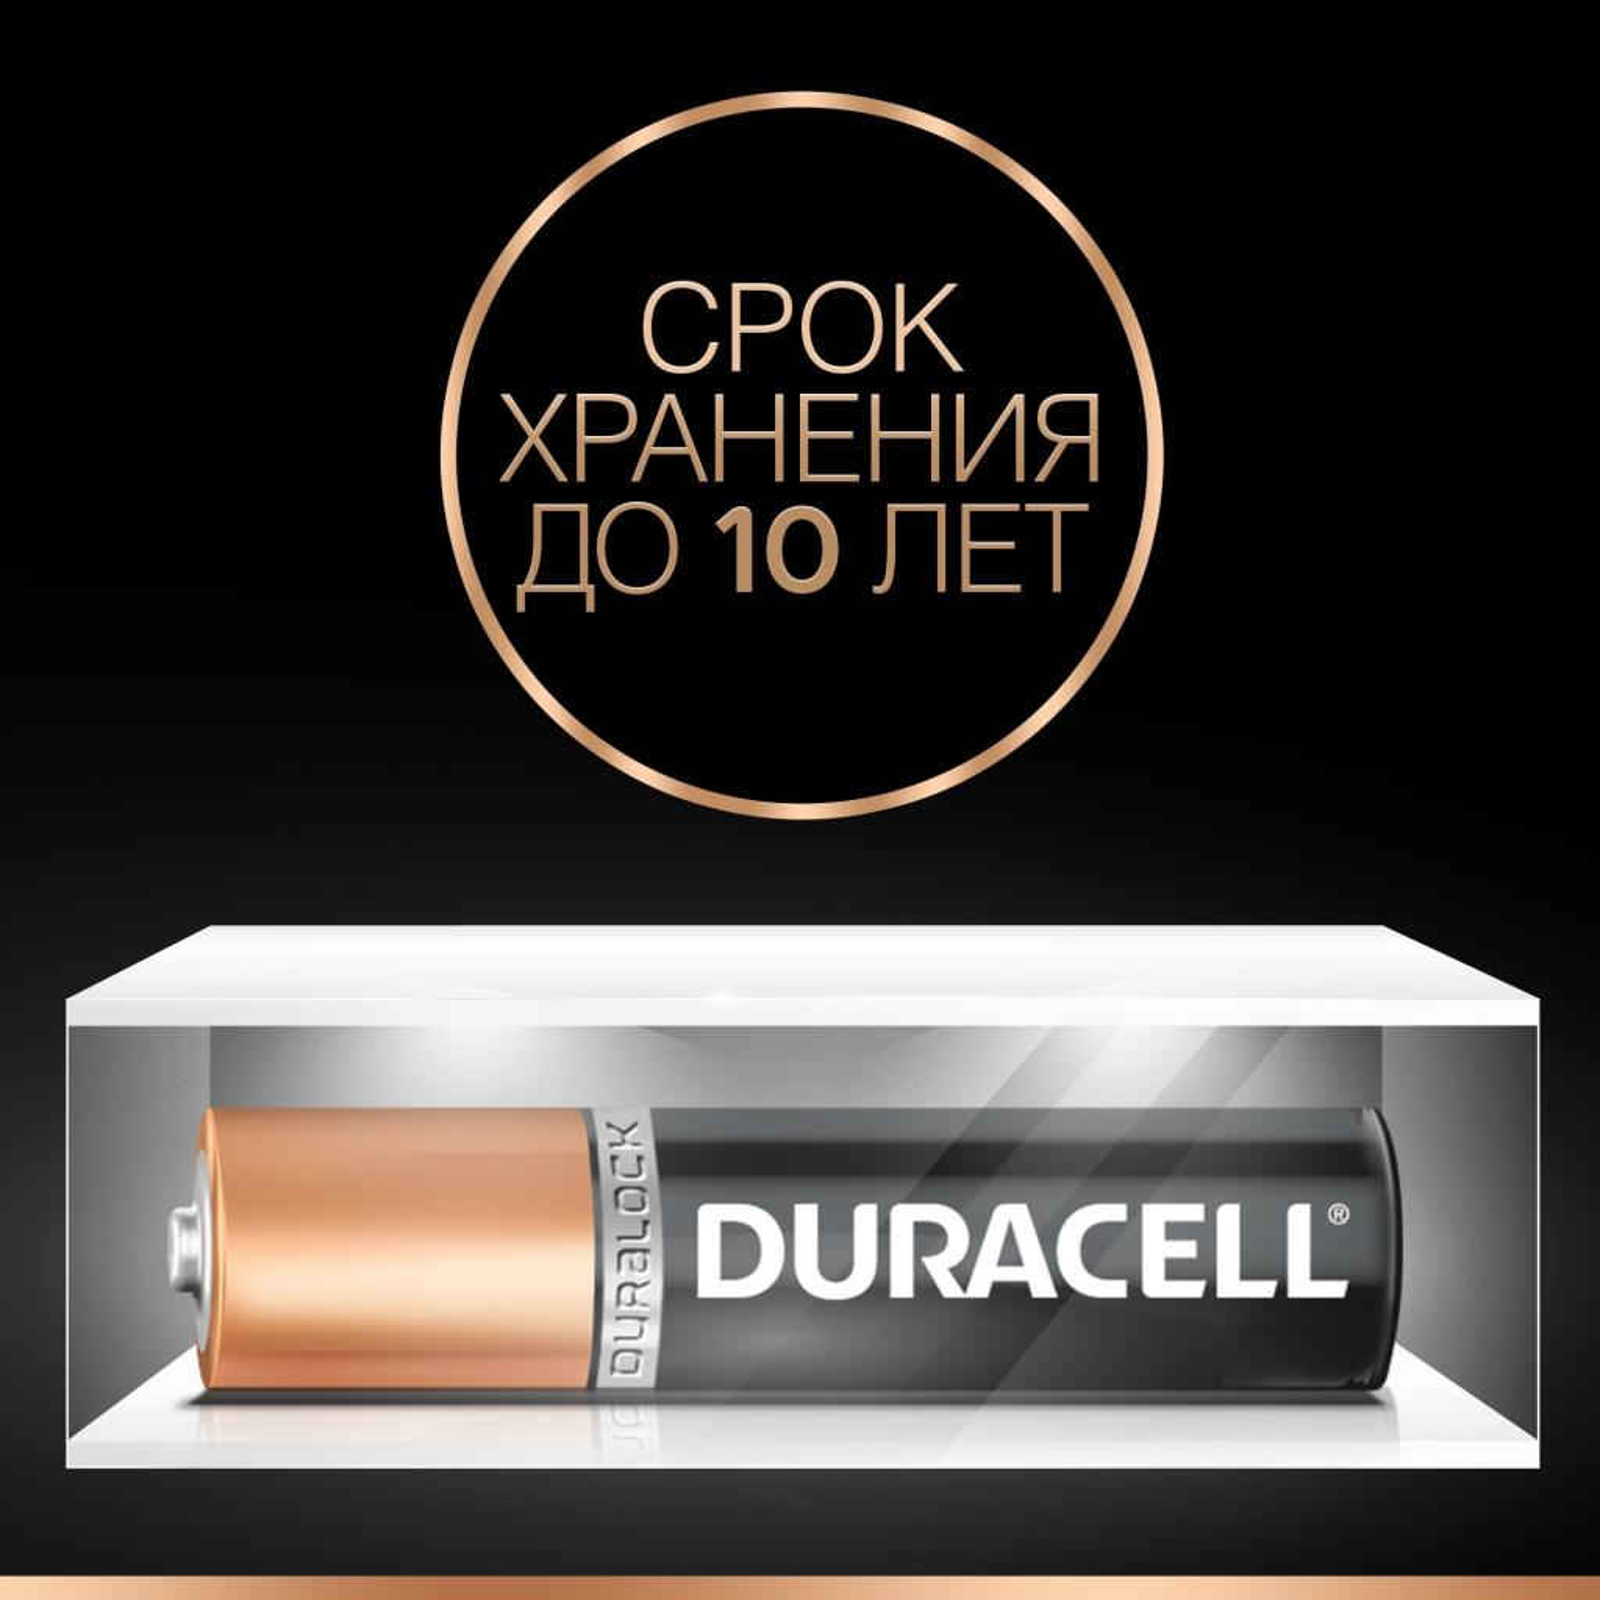 Батарейка Duracell AAA MN2400 LR03 * 2 (5000394058170 / 81484984) изображение 5